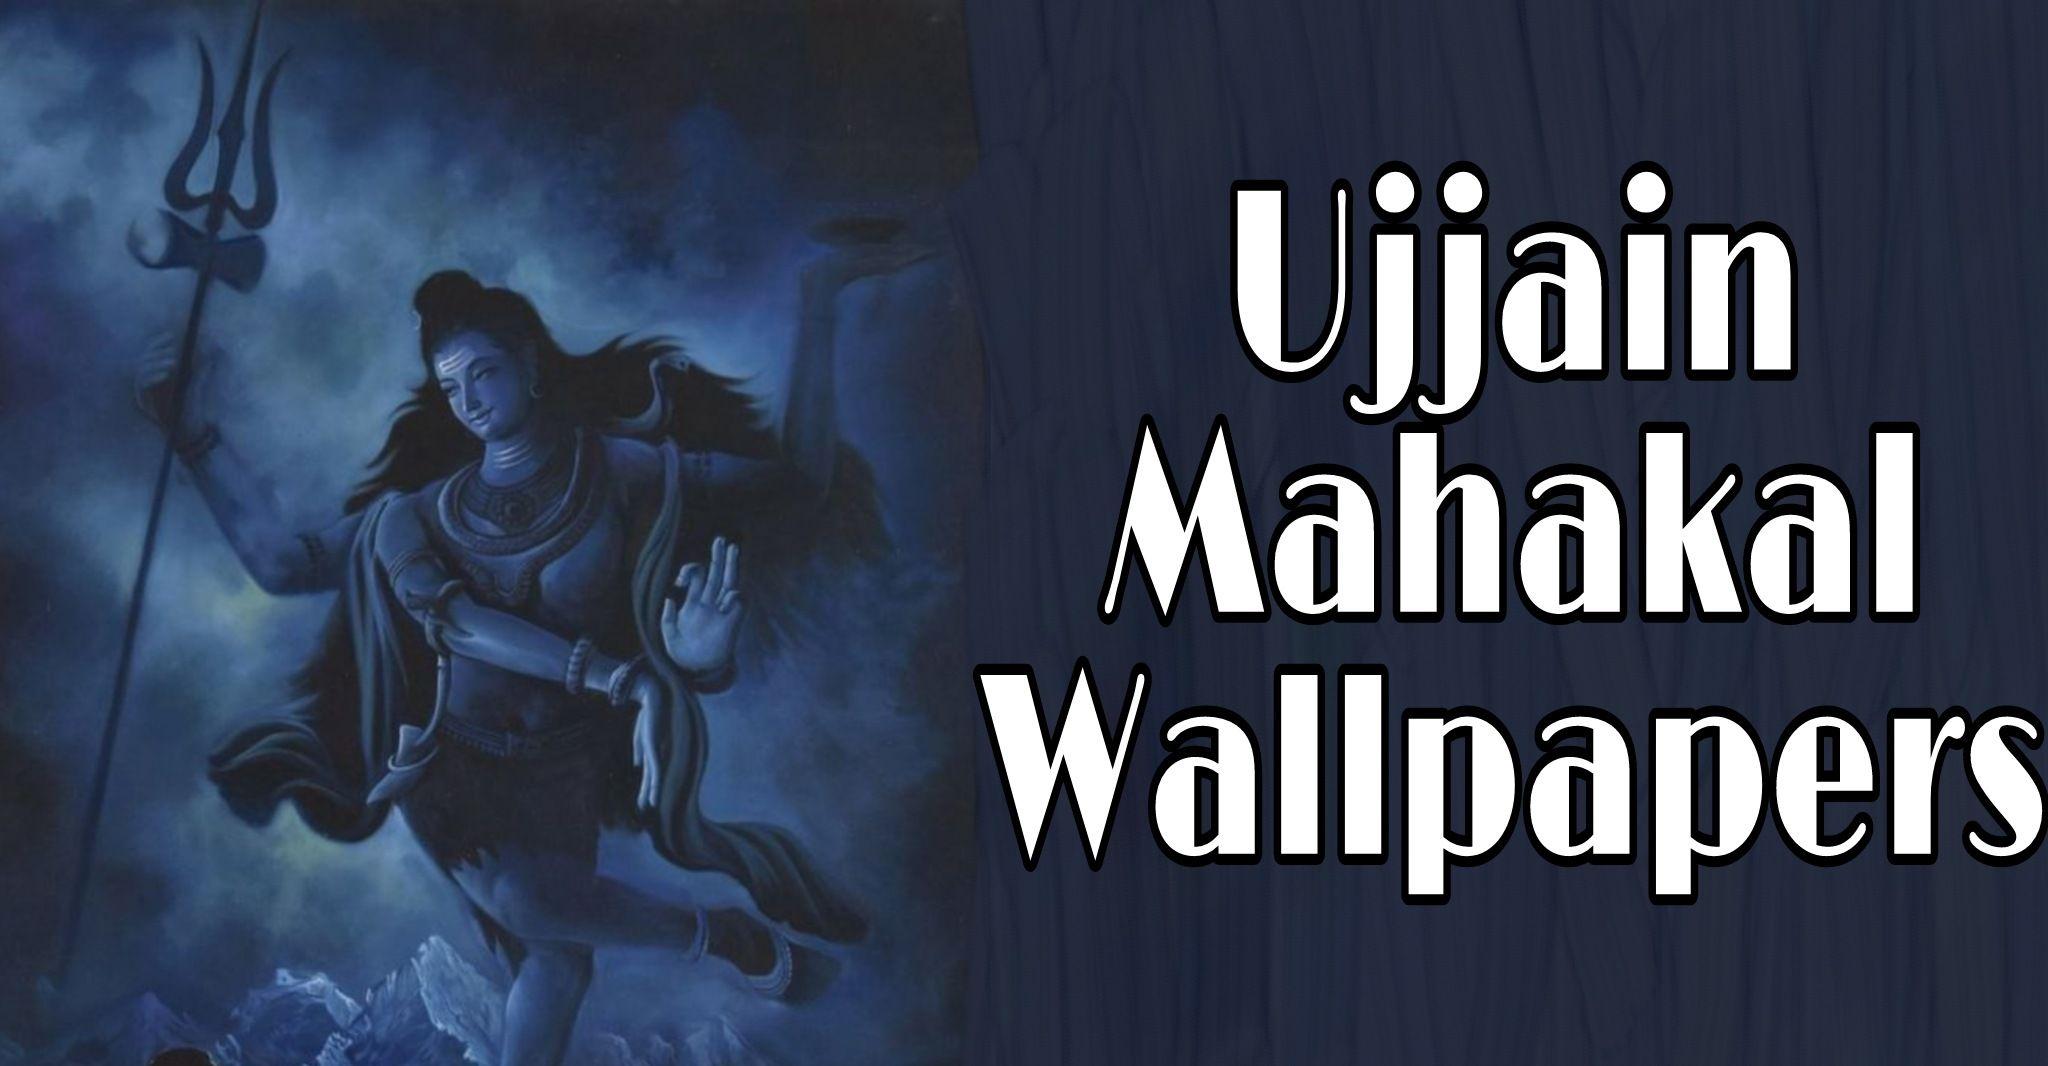 Ujjain Mahakal Wallpapers Download